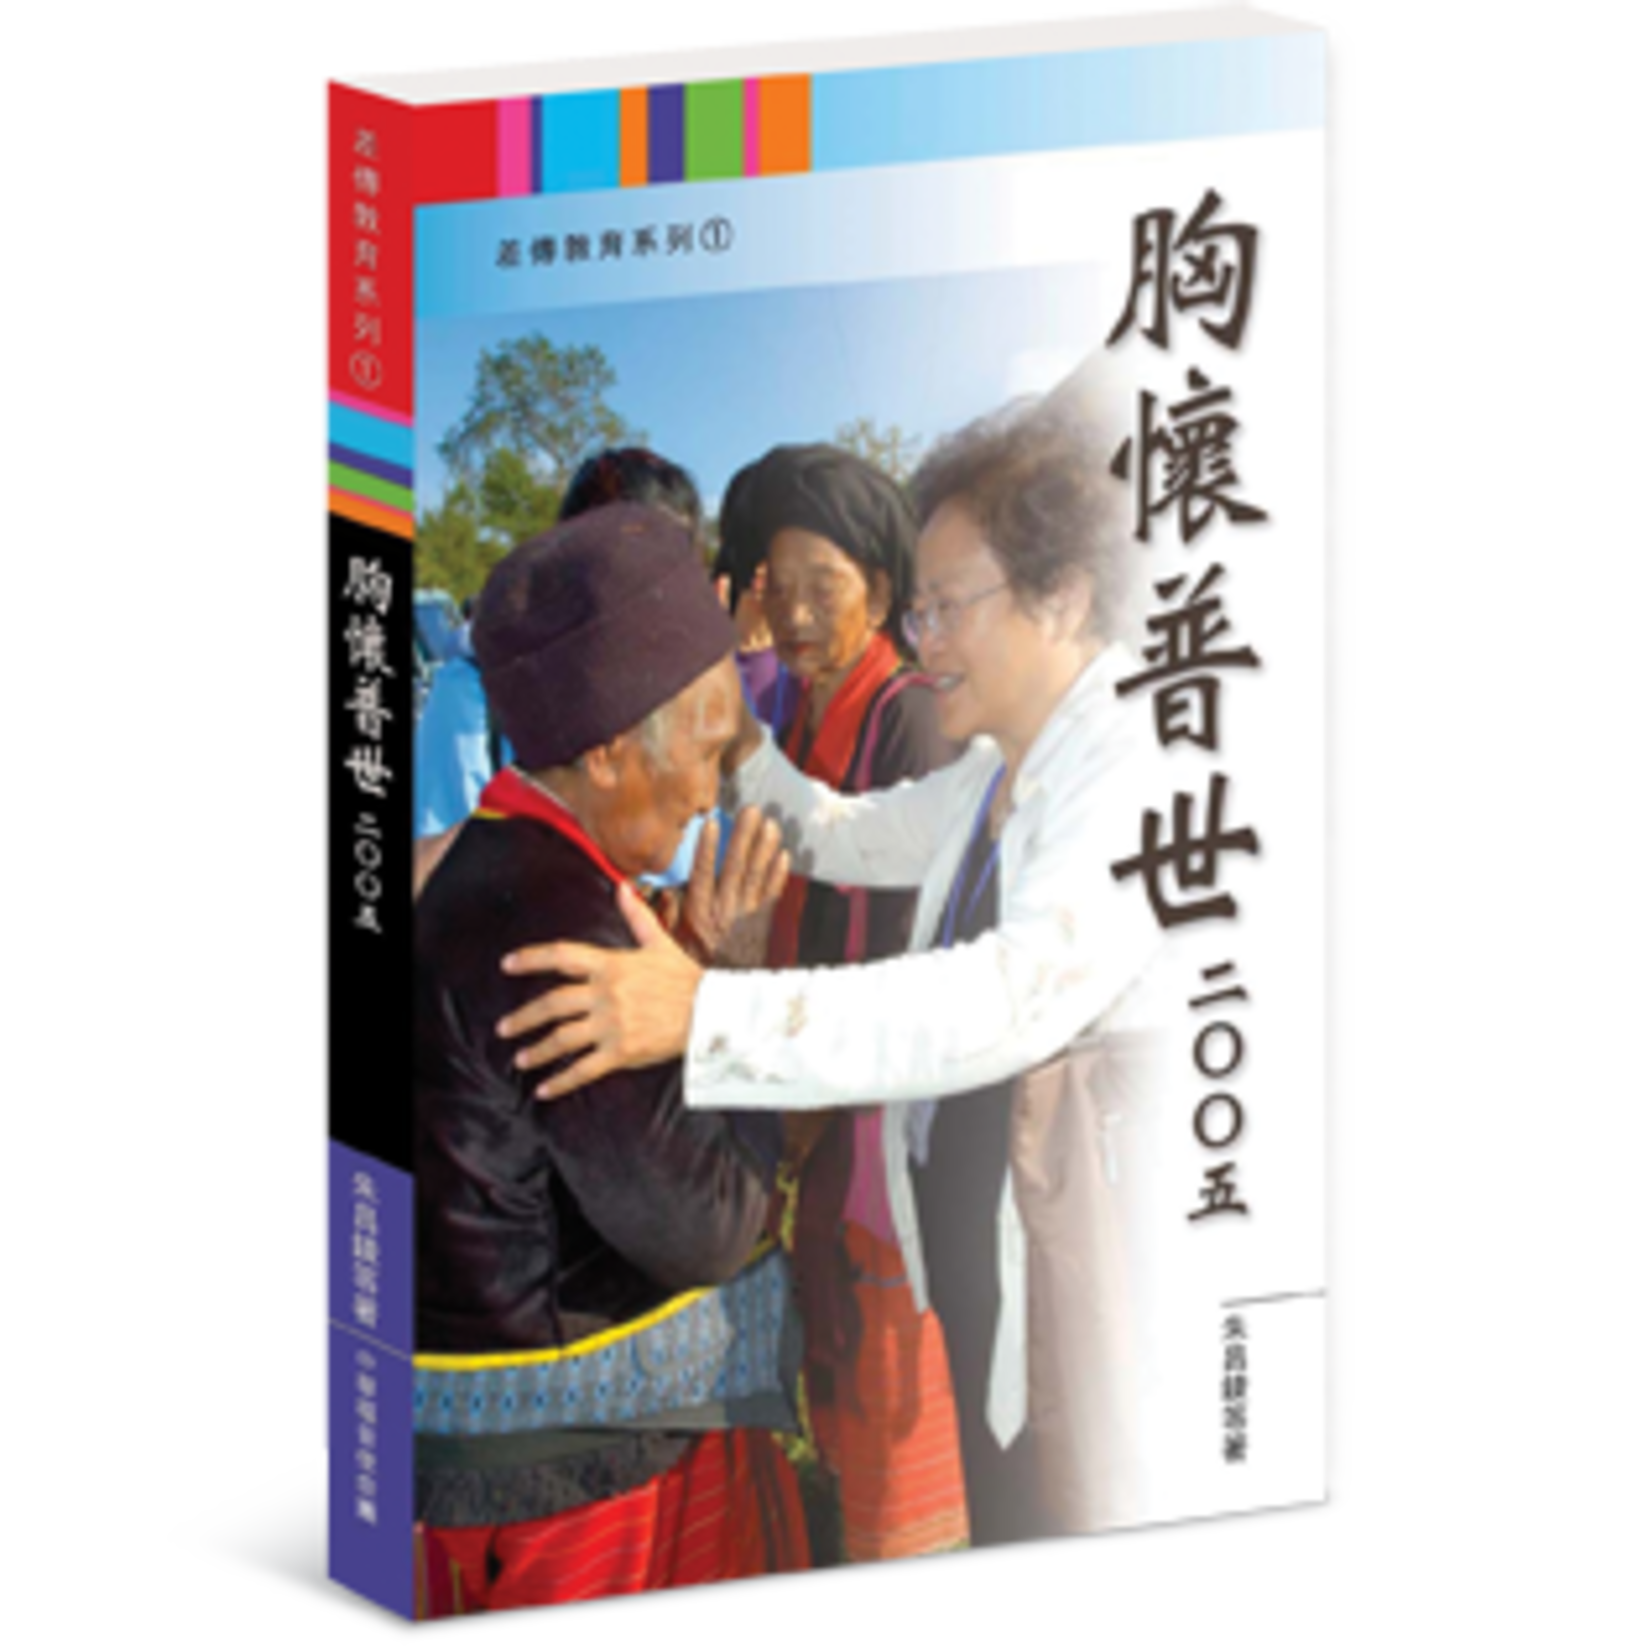 中華福音使命團 China Evangelistic Mission 胸懷普世2005